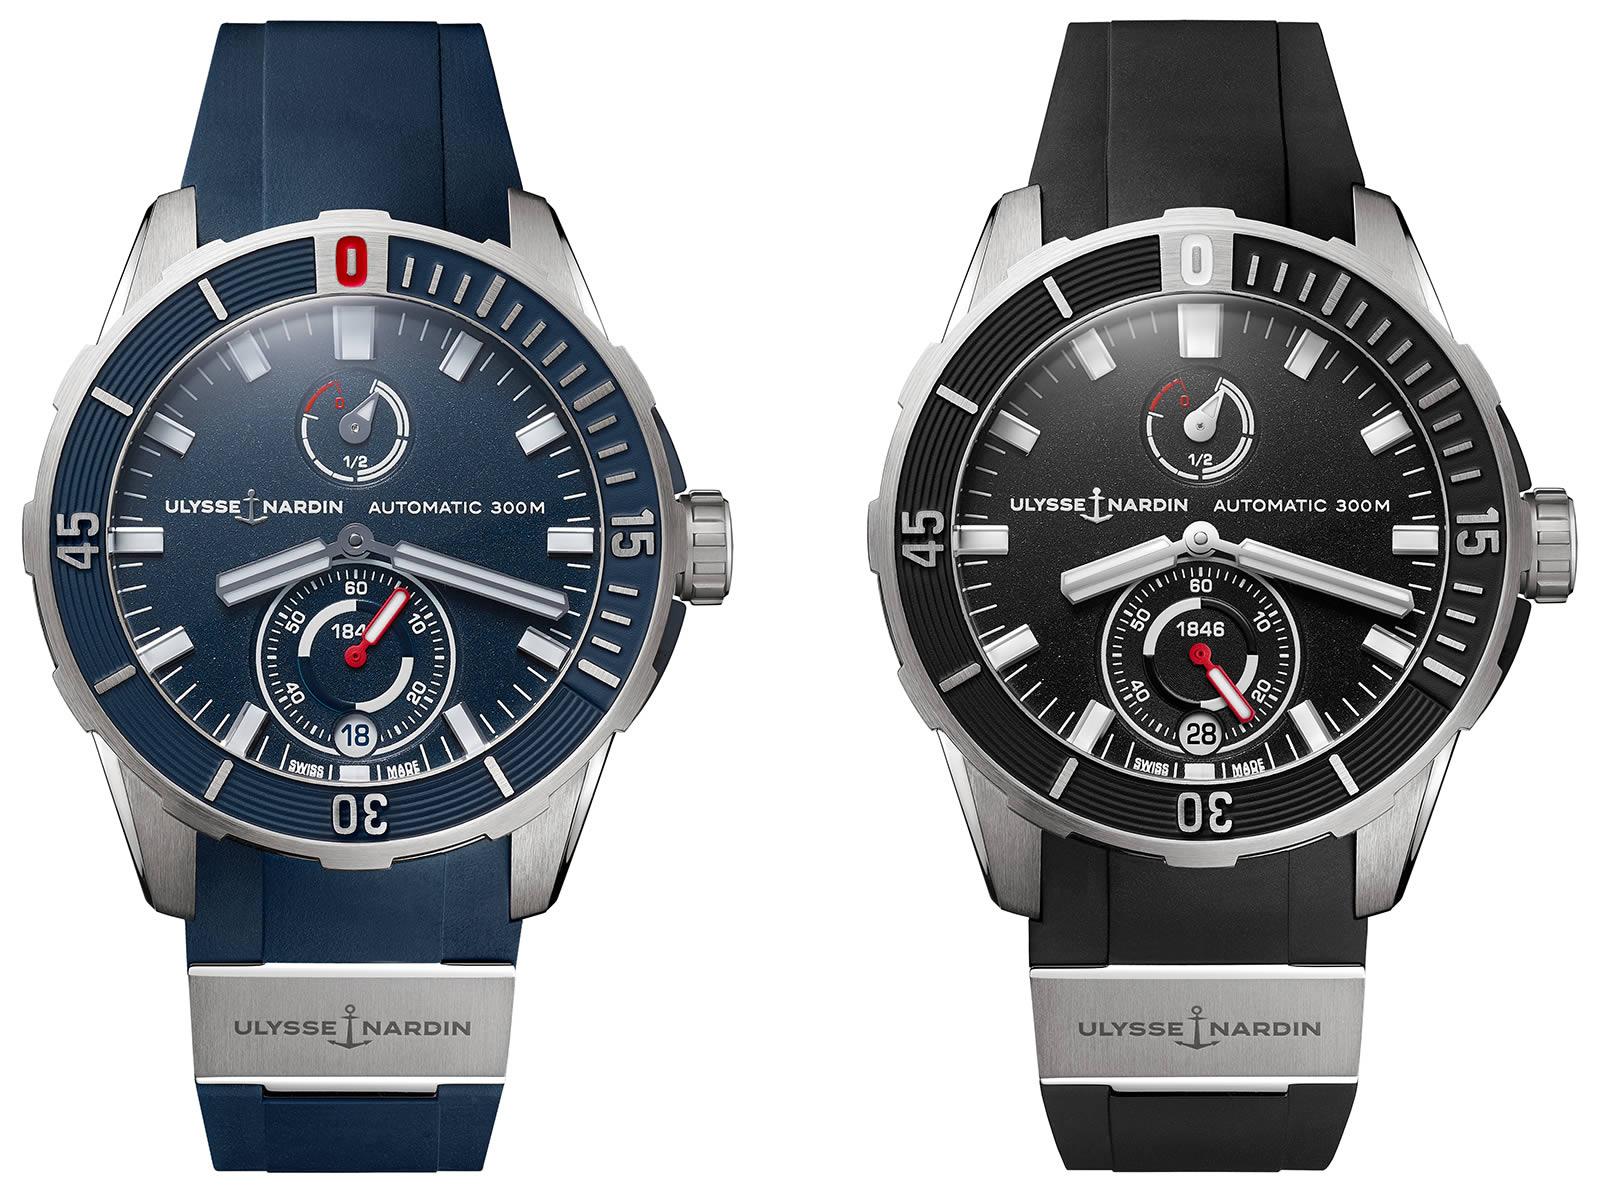 ulysse-nardin-diver-chronometer-2018-models-15-.jpg